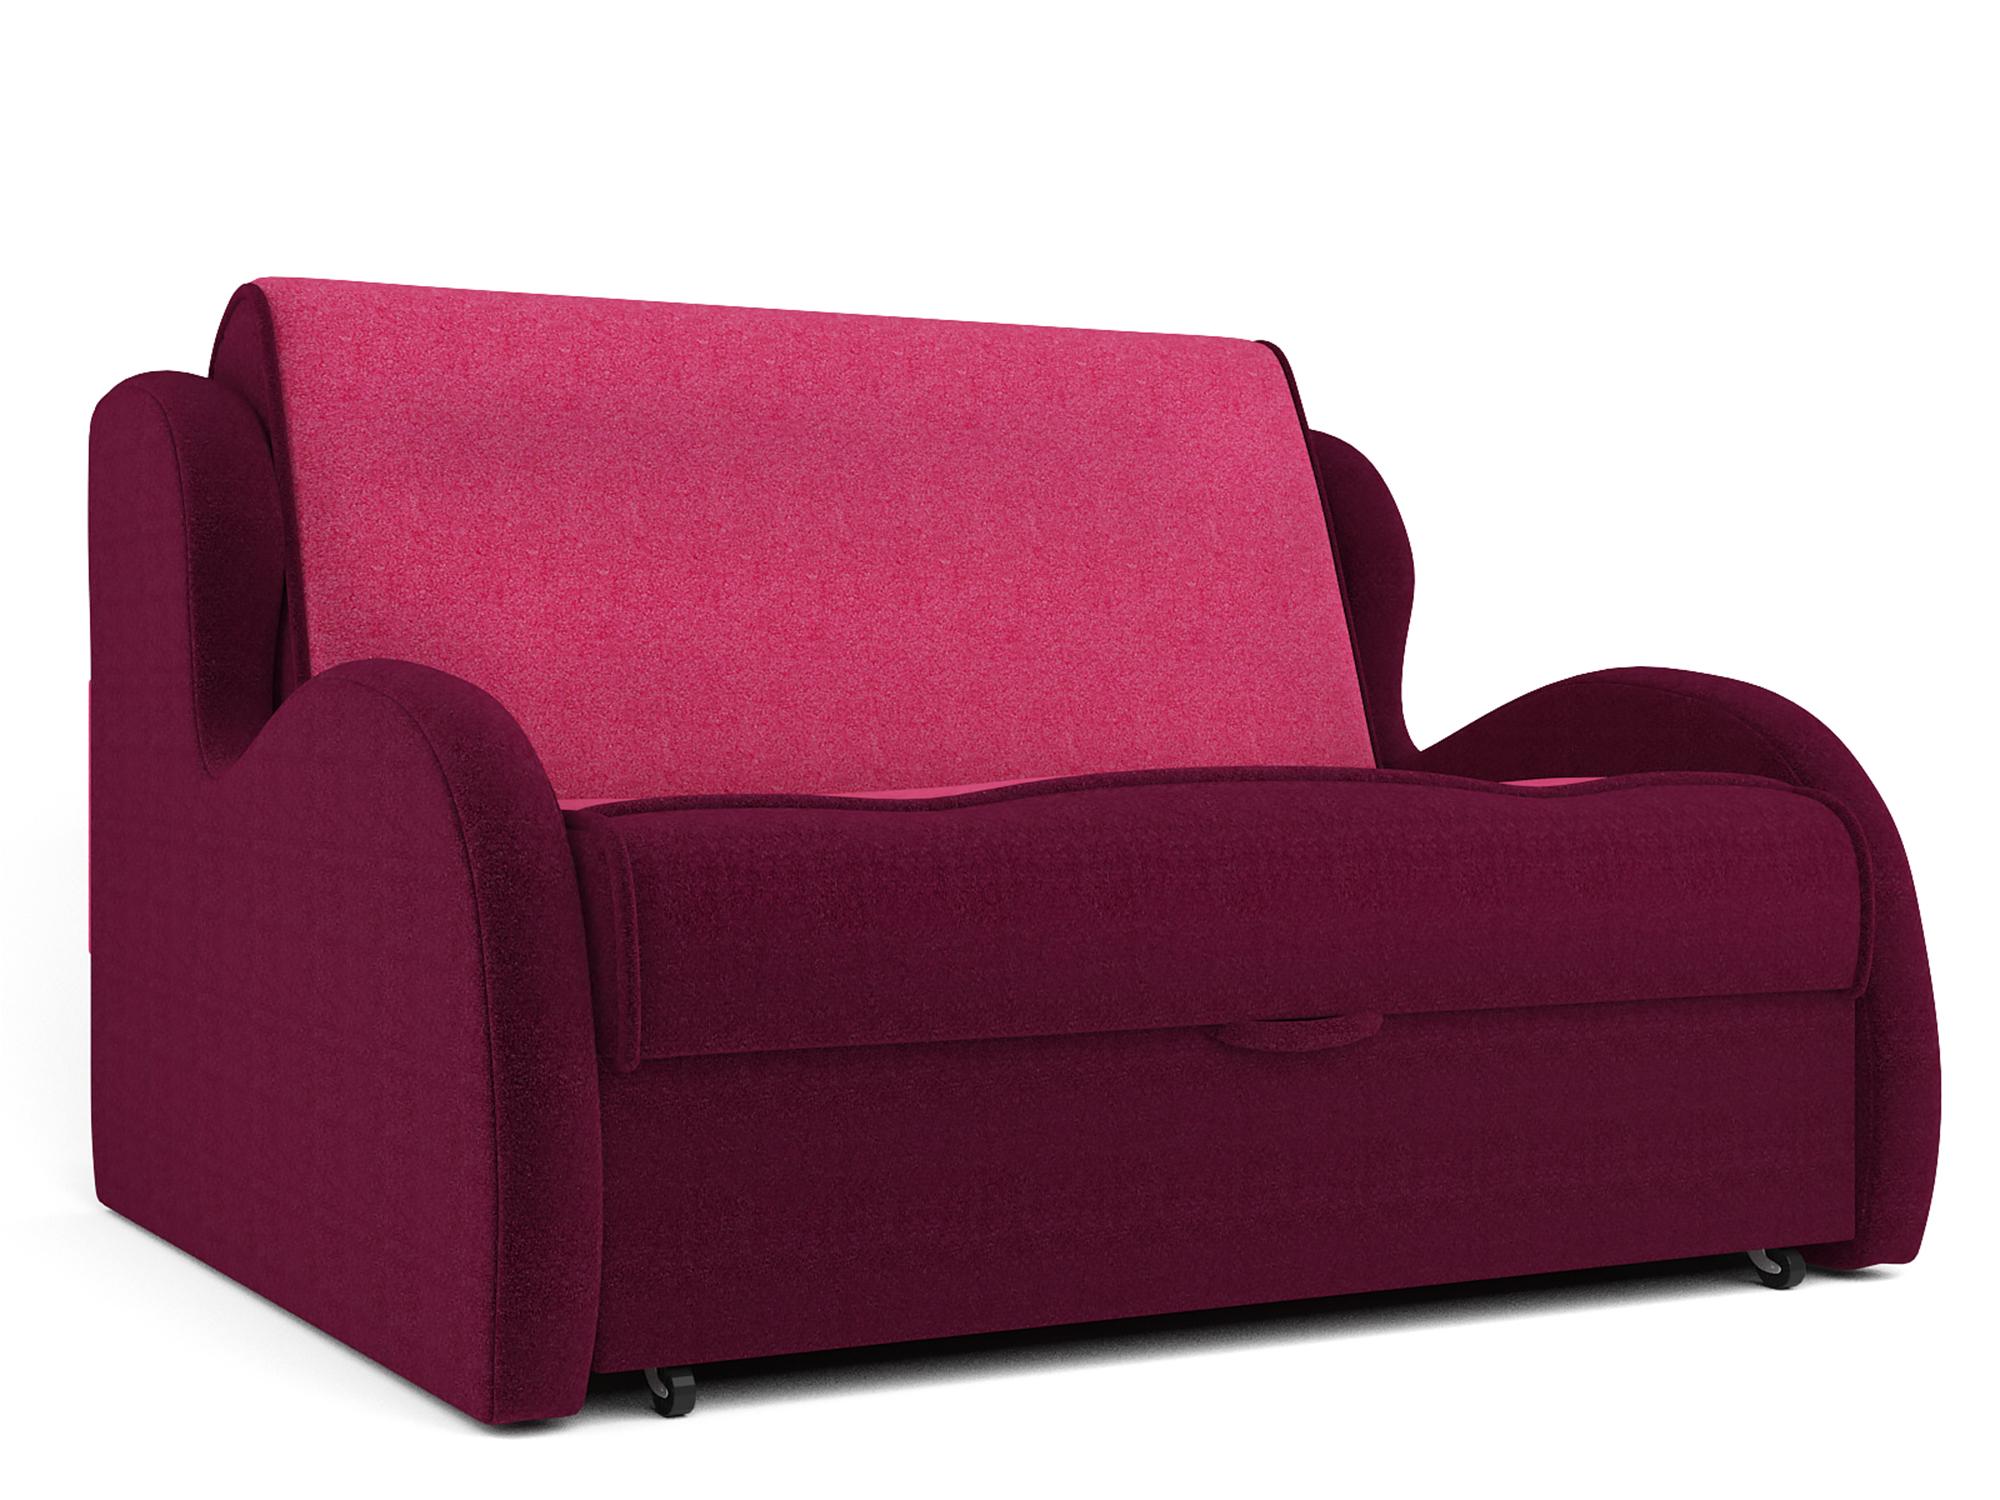 Диван Алан (140х195) MebelVia Красный, Розовый